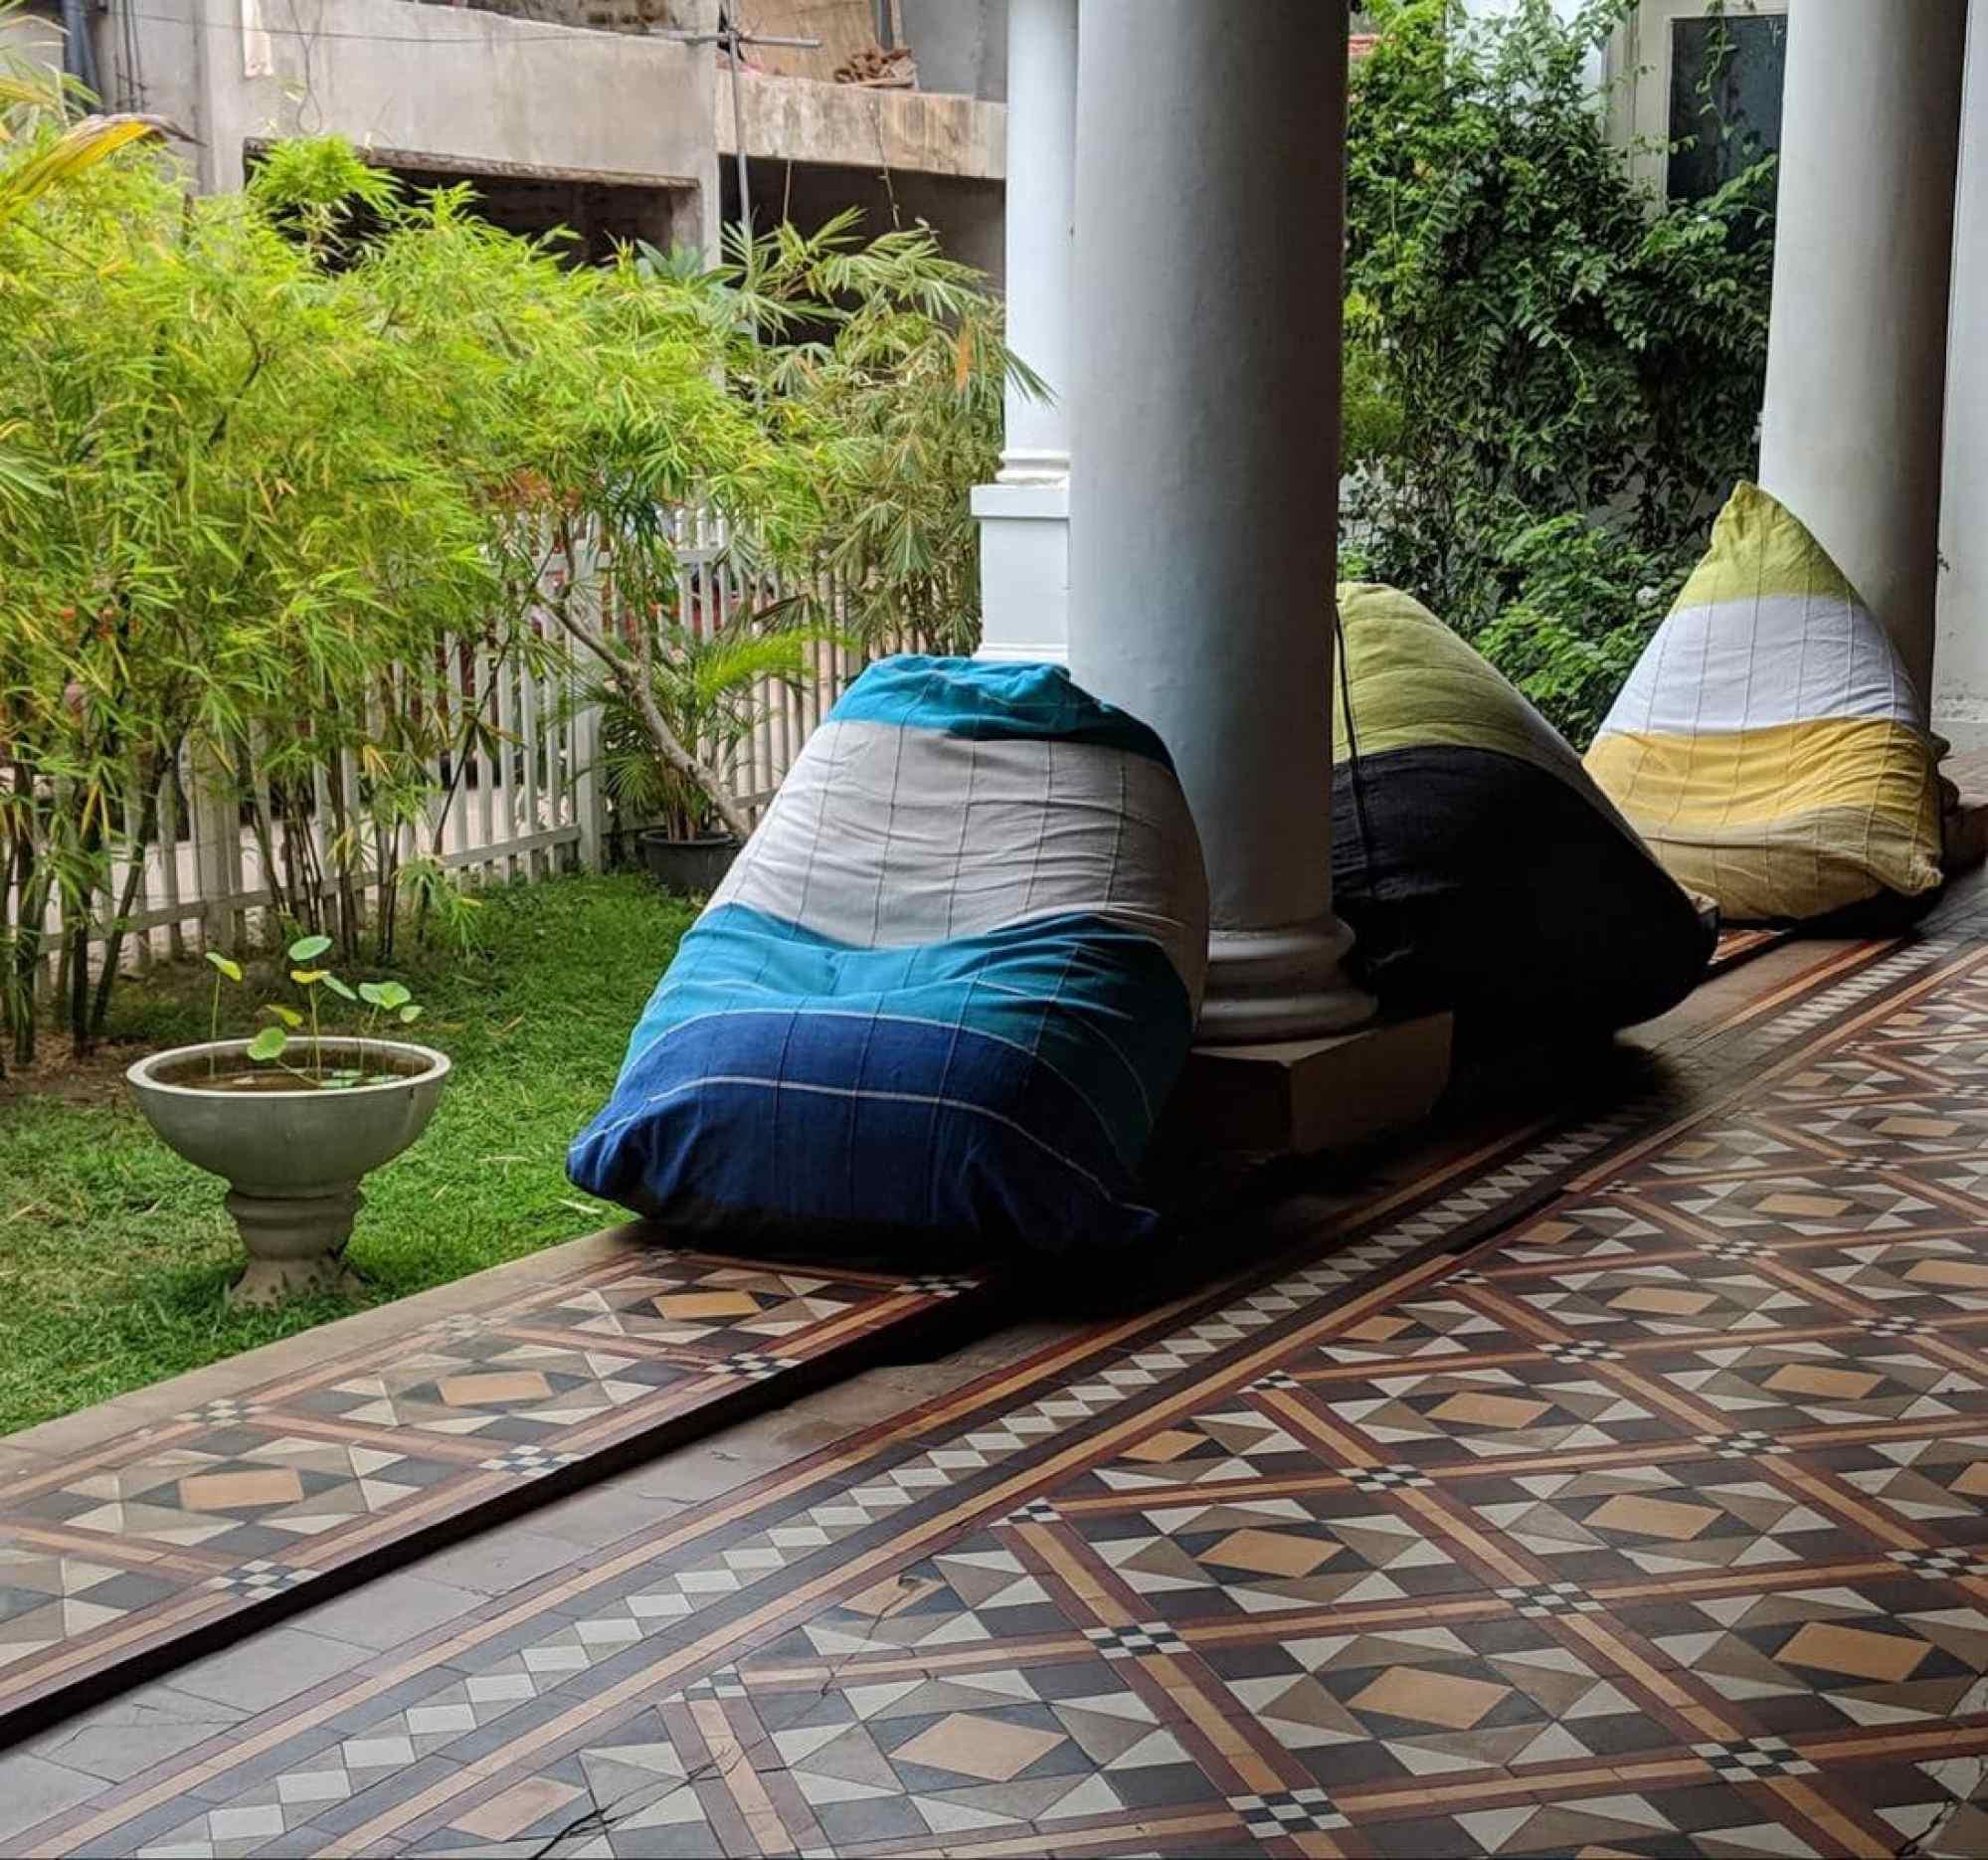 Outdoor verandah at Cafe Kumbuk